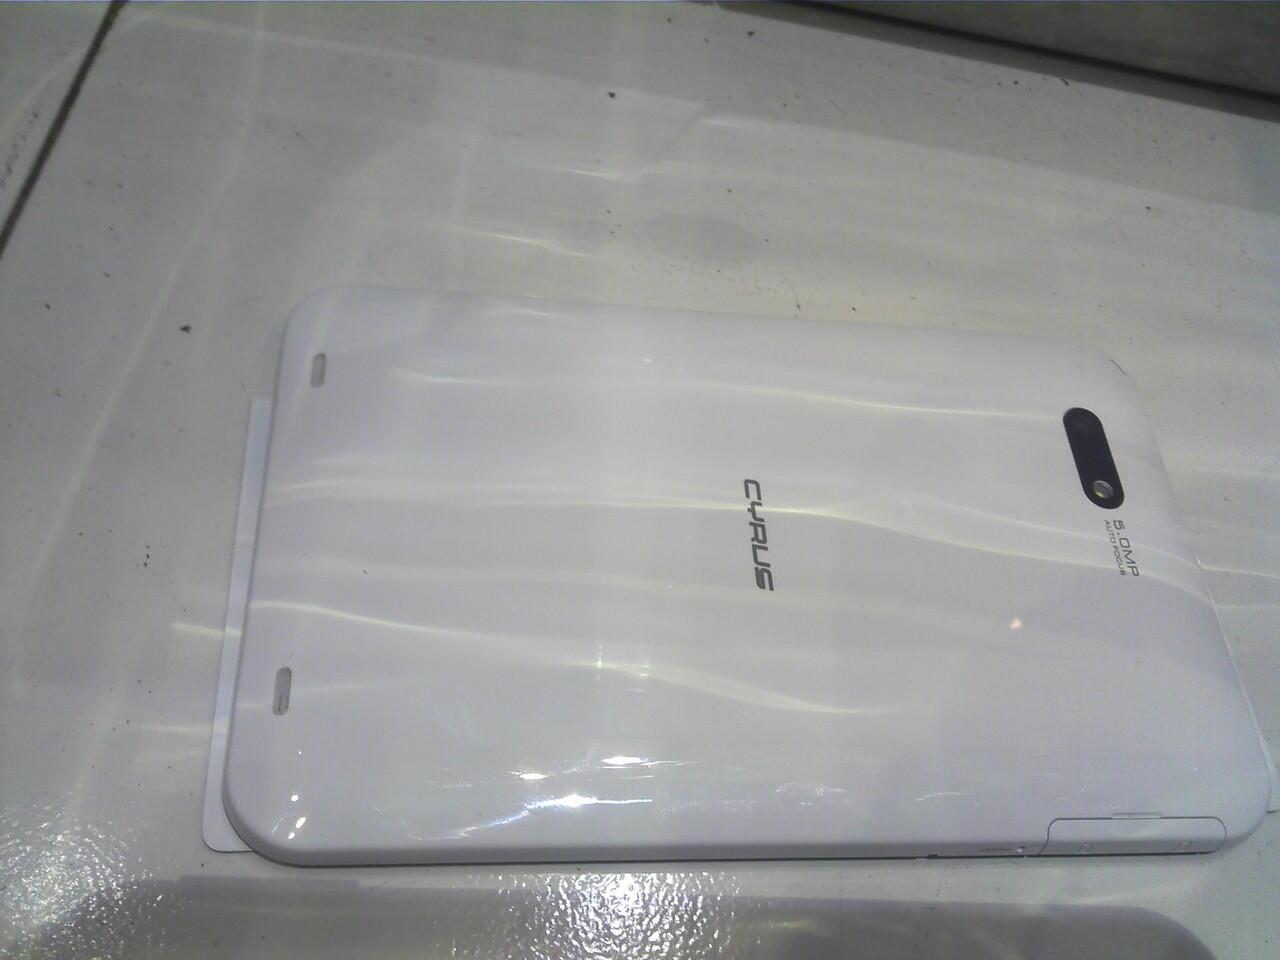 cyrus slim 7 inch 3g wifi ics